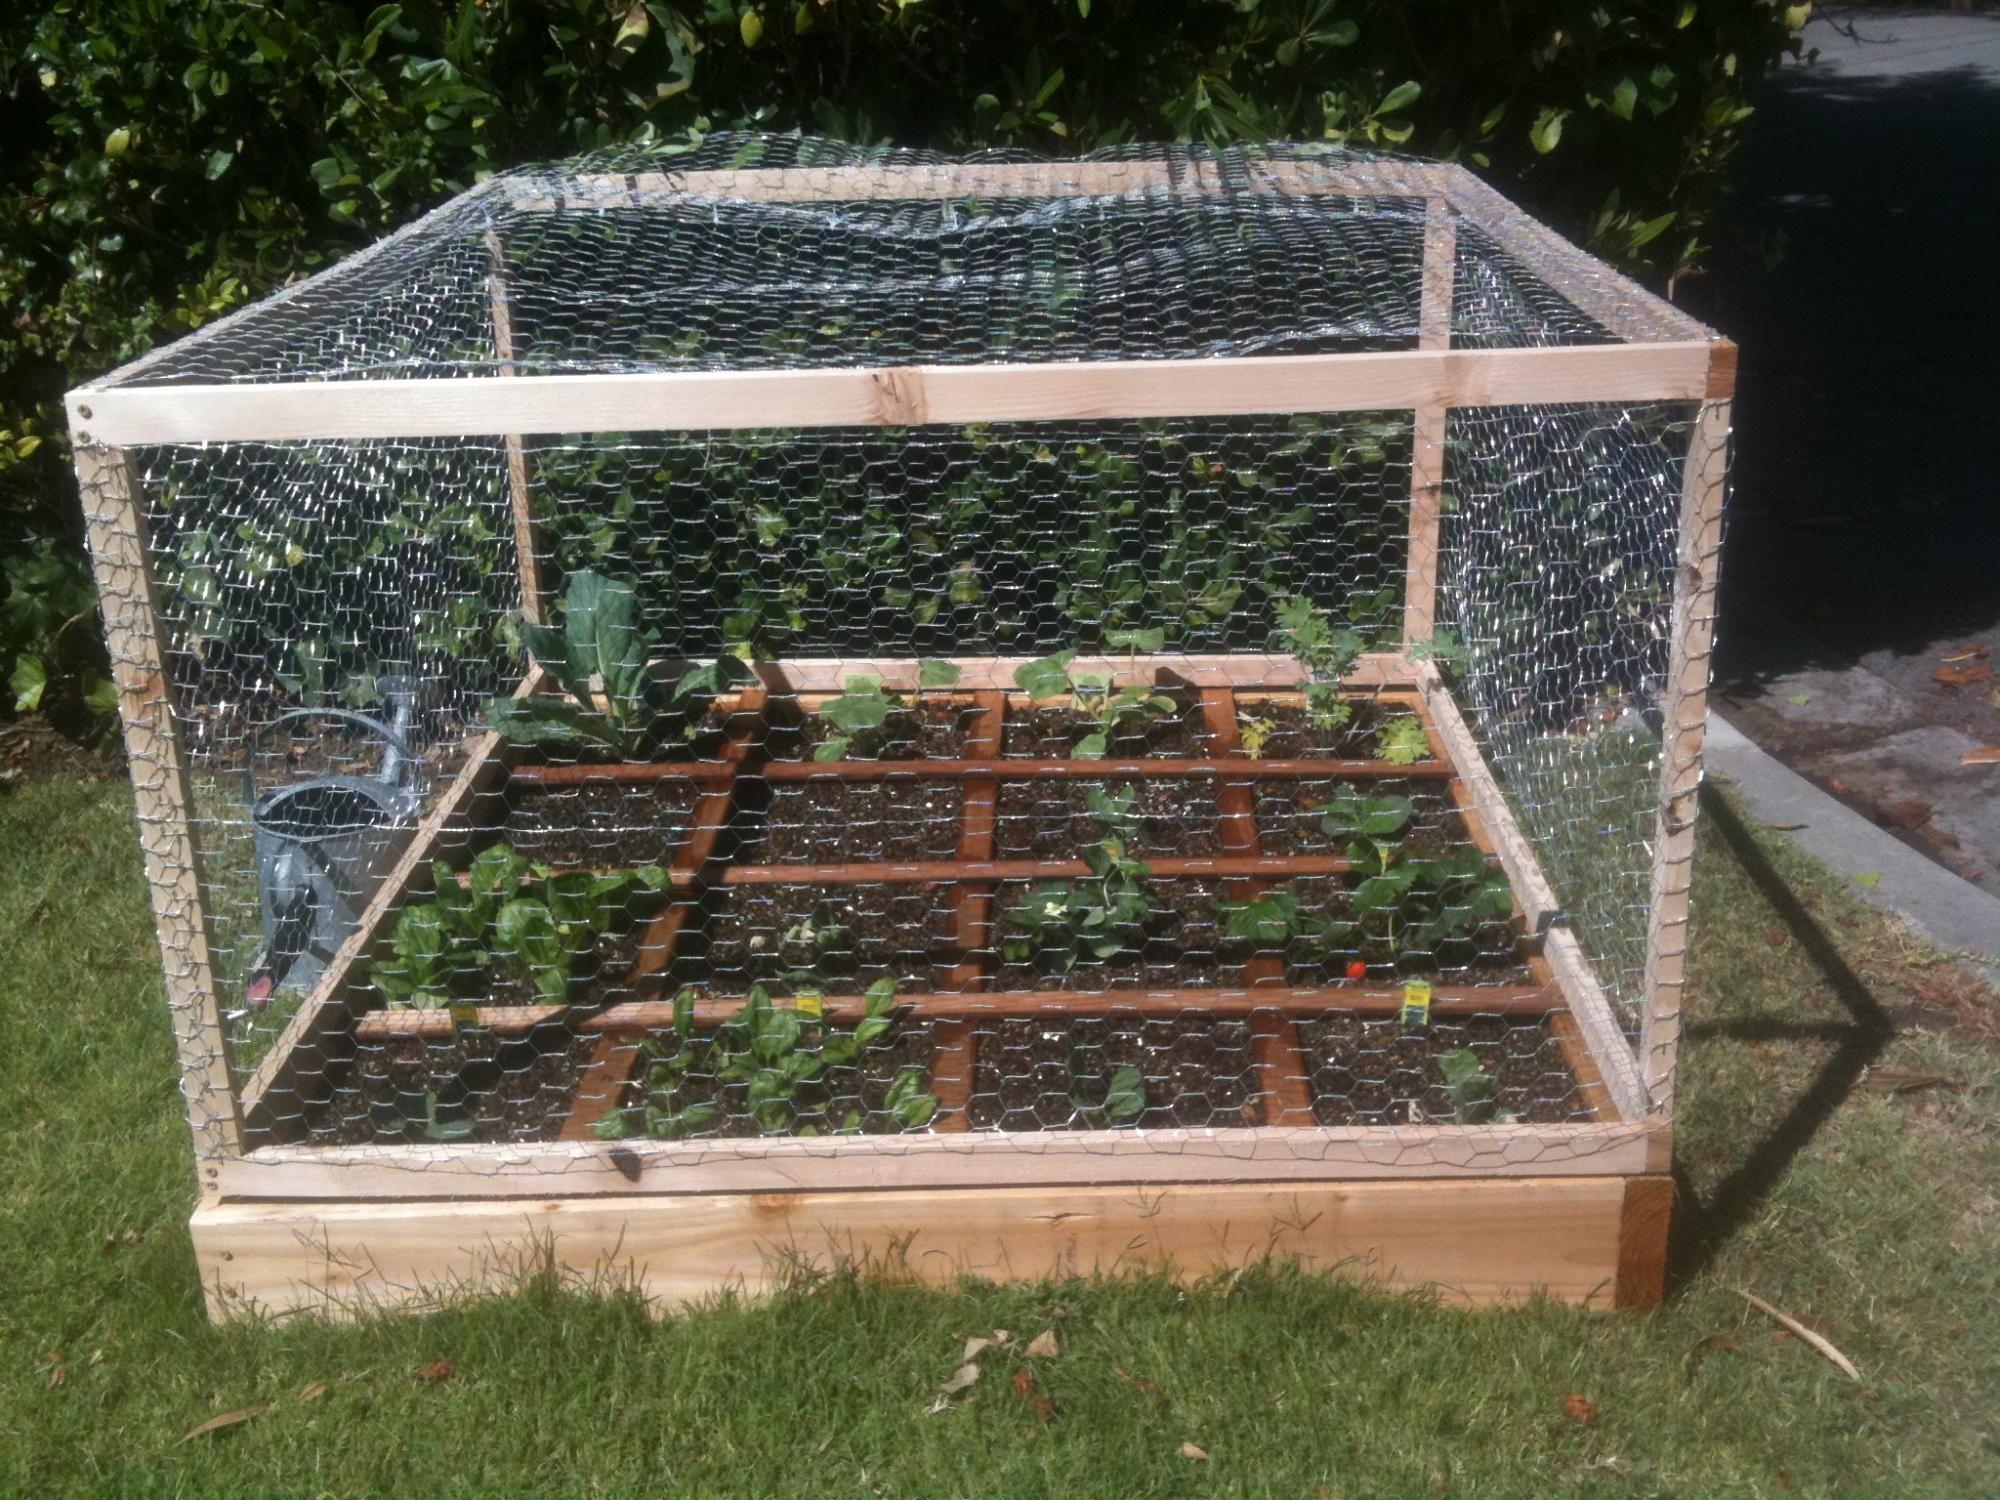 Square Foot Gardening Squirrel Proof Garden Square Foot Gardening Container Gardening Vegetables